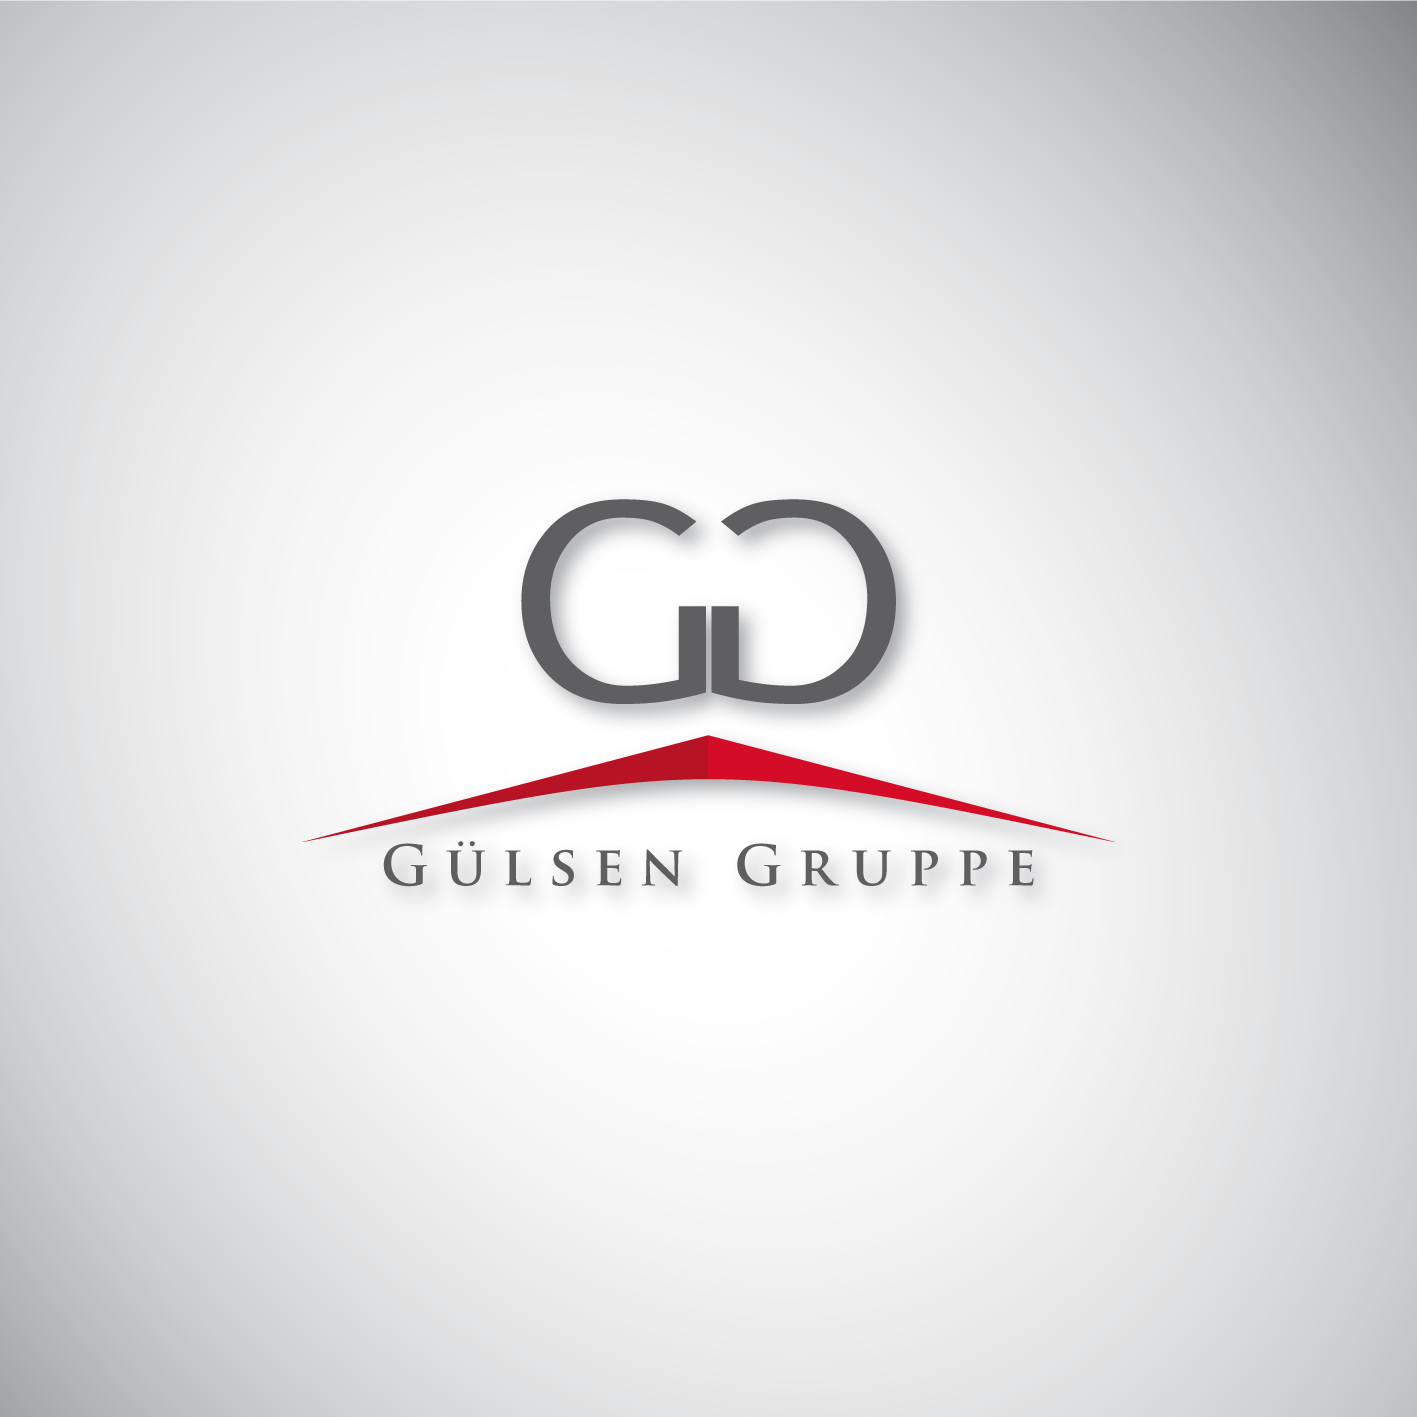 guelsen_logo